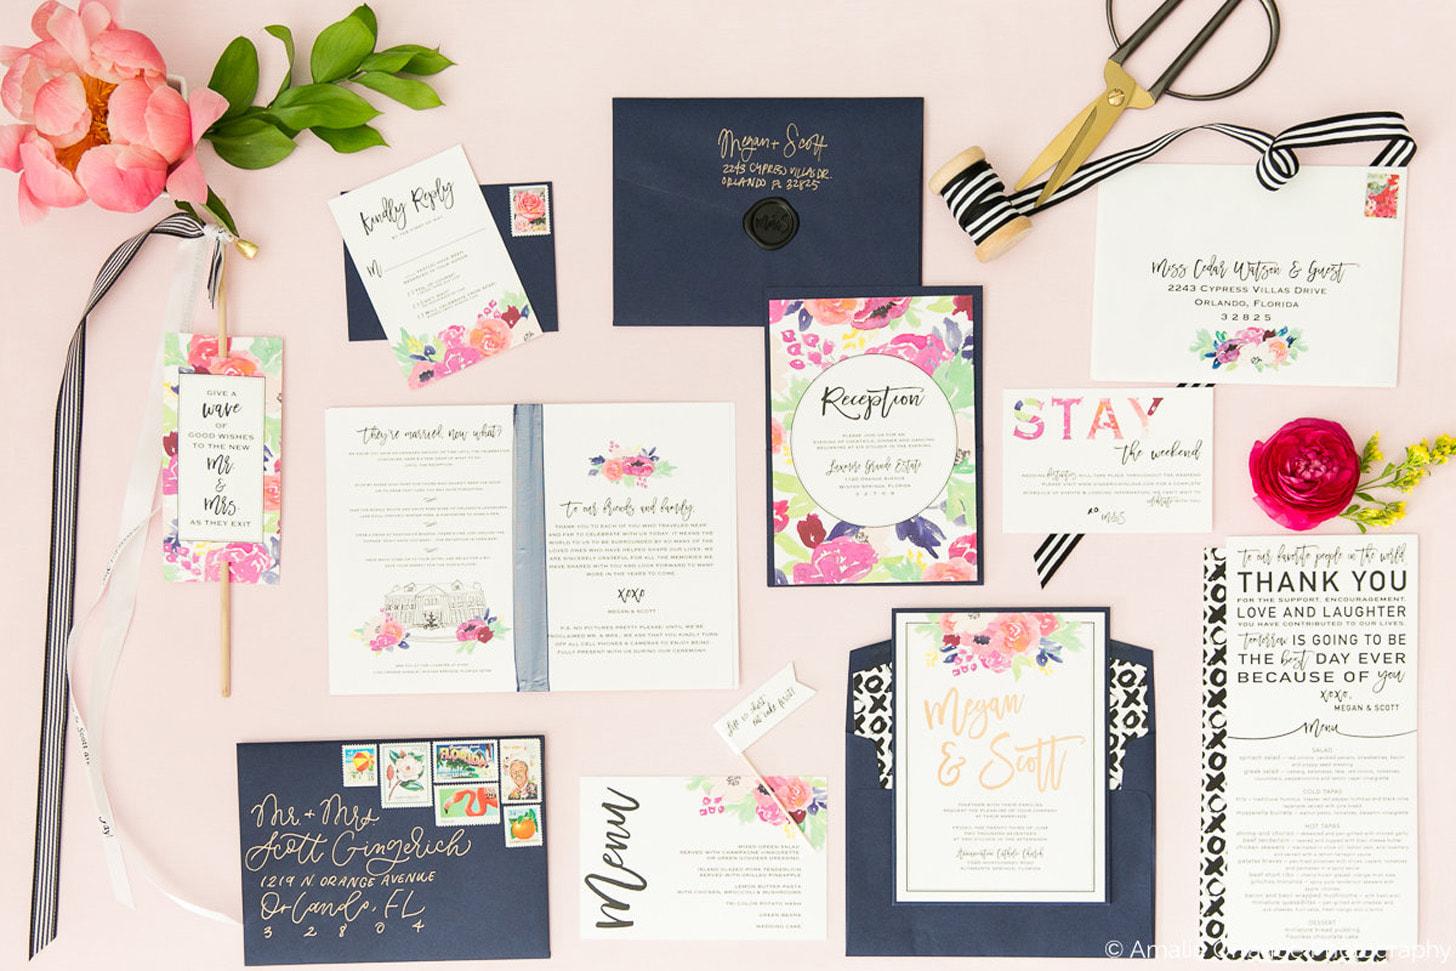 Paper Goat Wedding Invitation